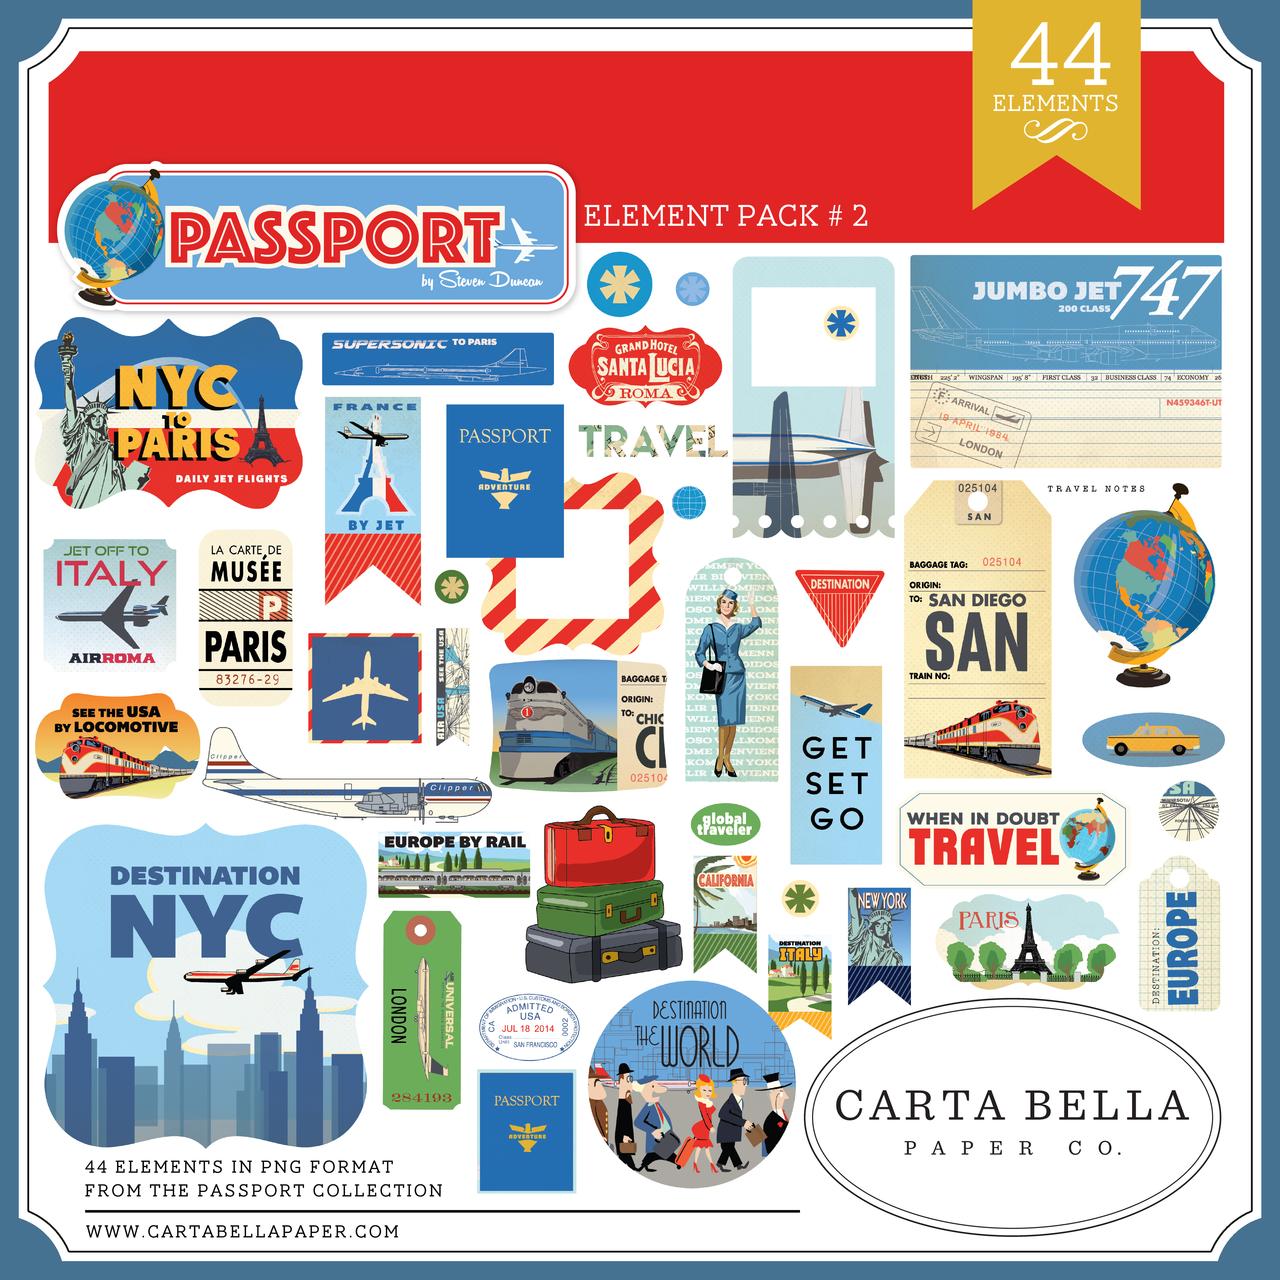 Passport Element Pack #2